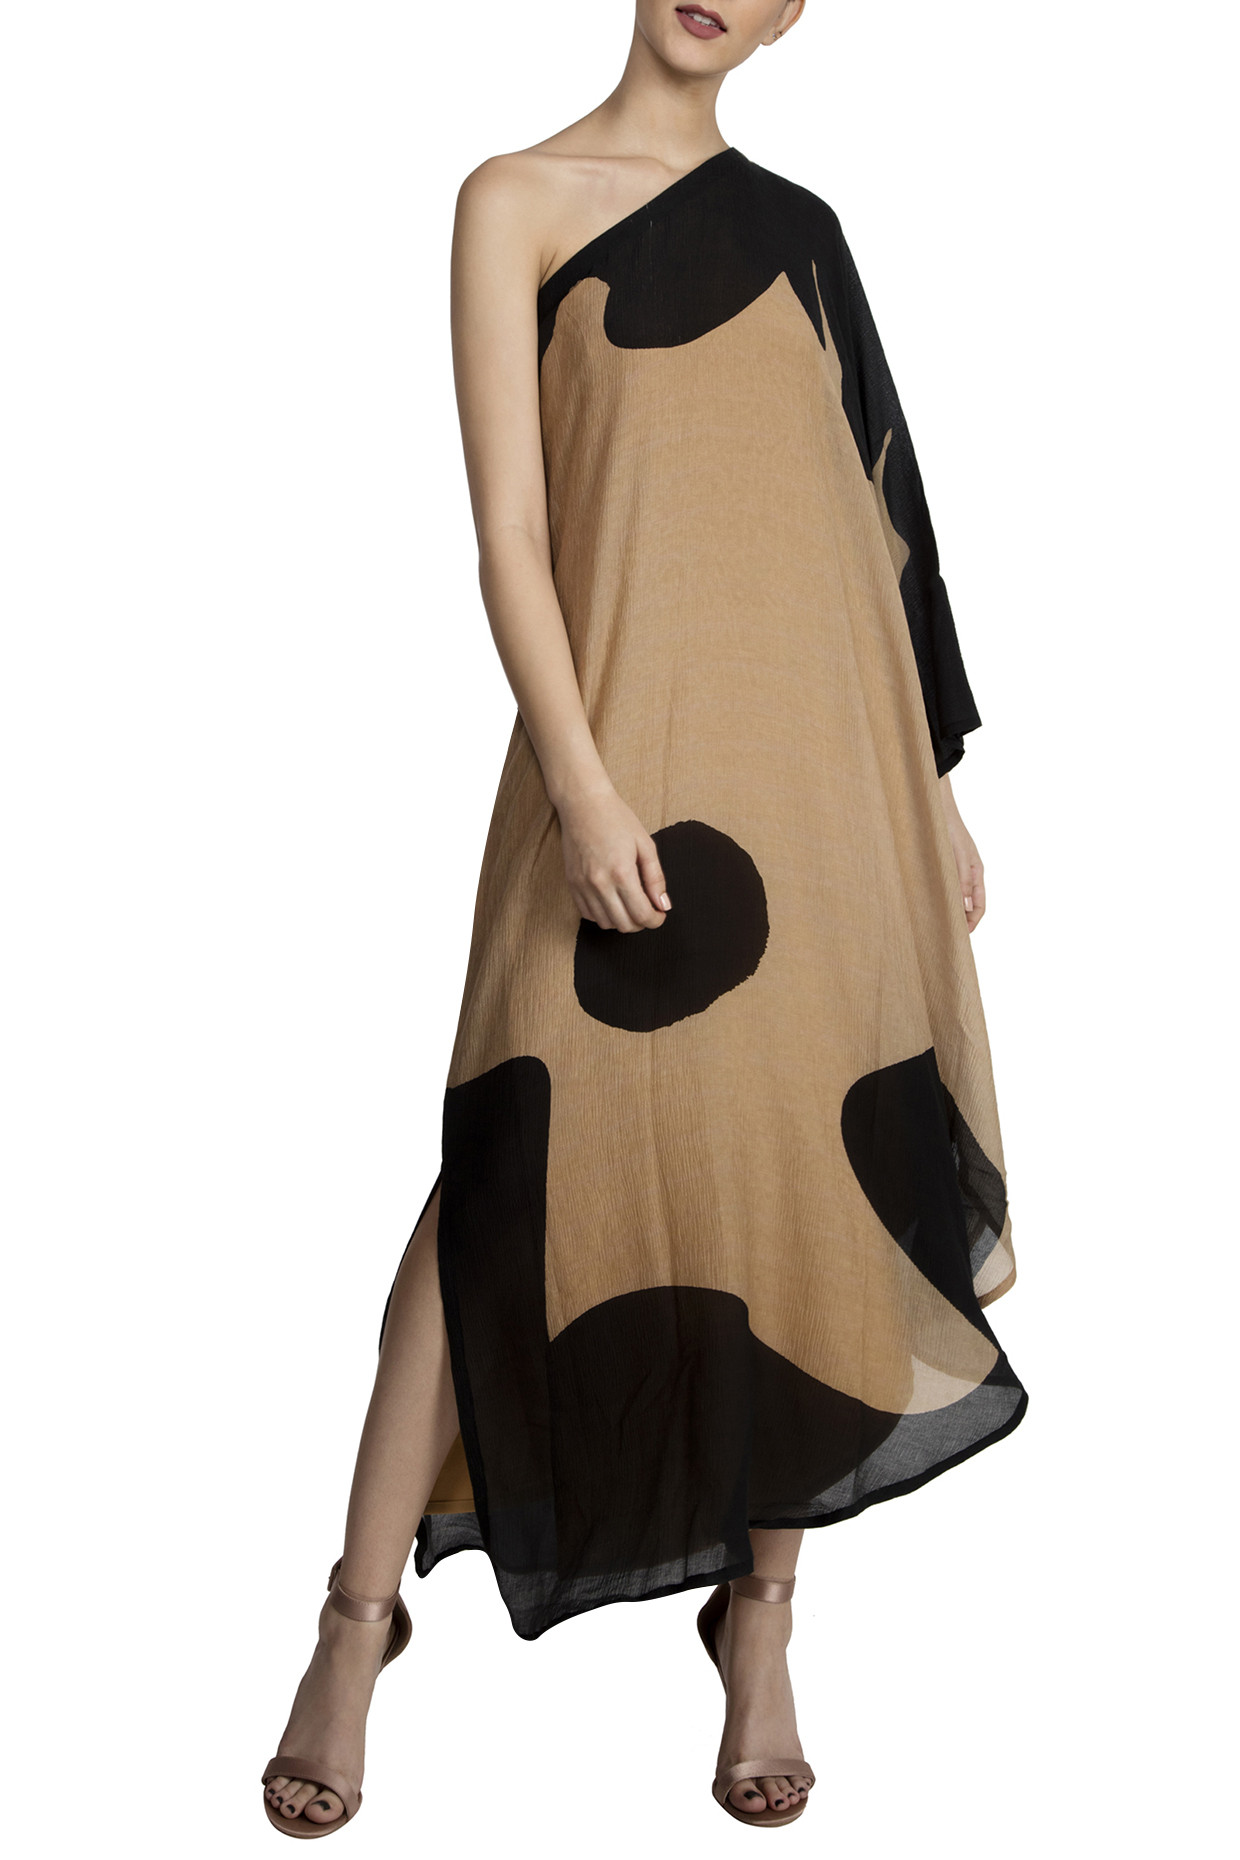 Black Splash Print One Shoulder Dress by Masaba